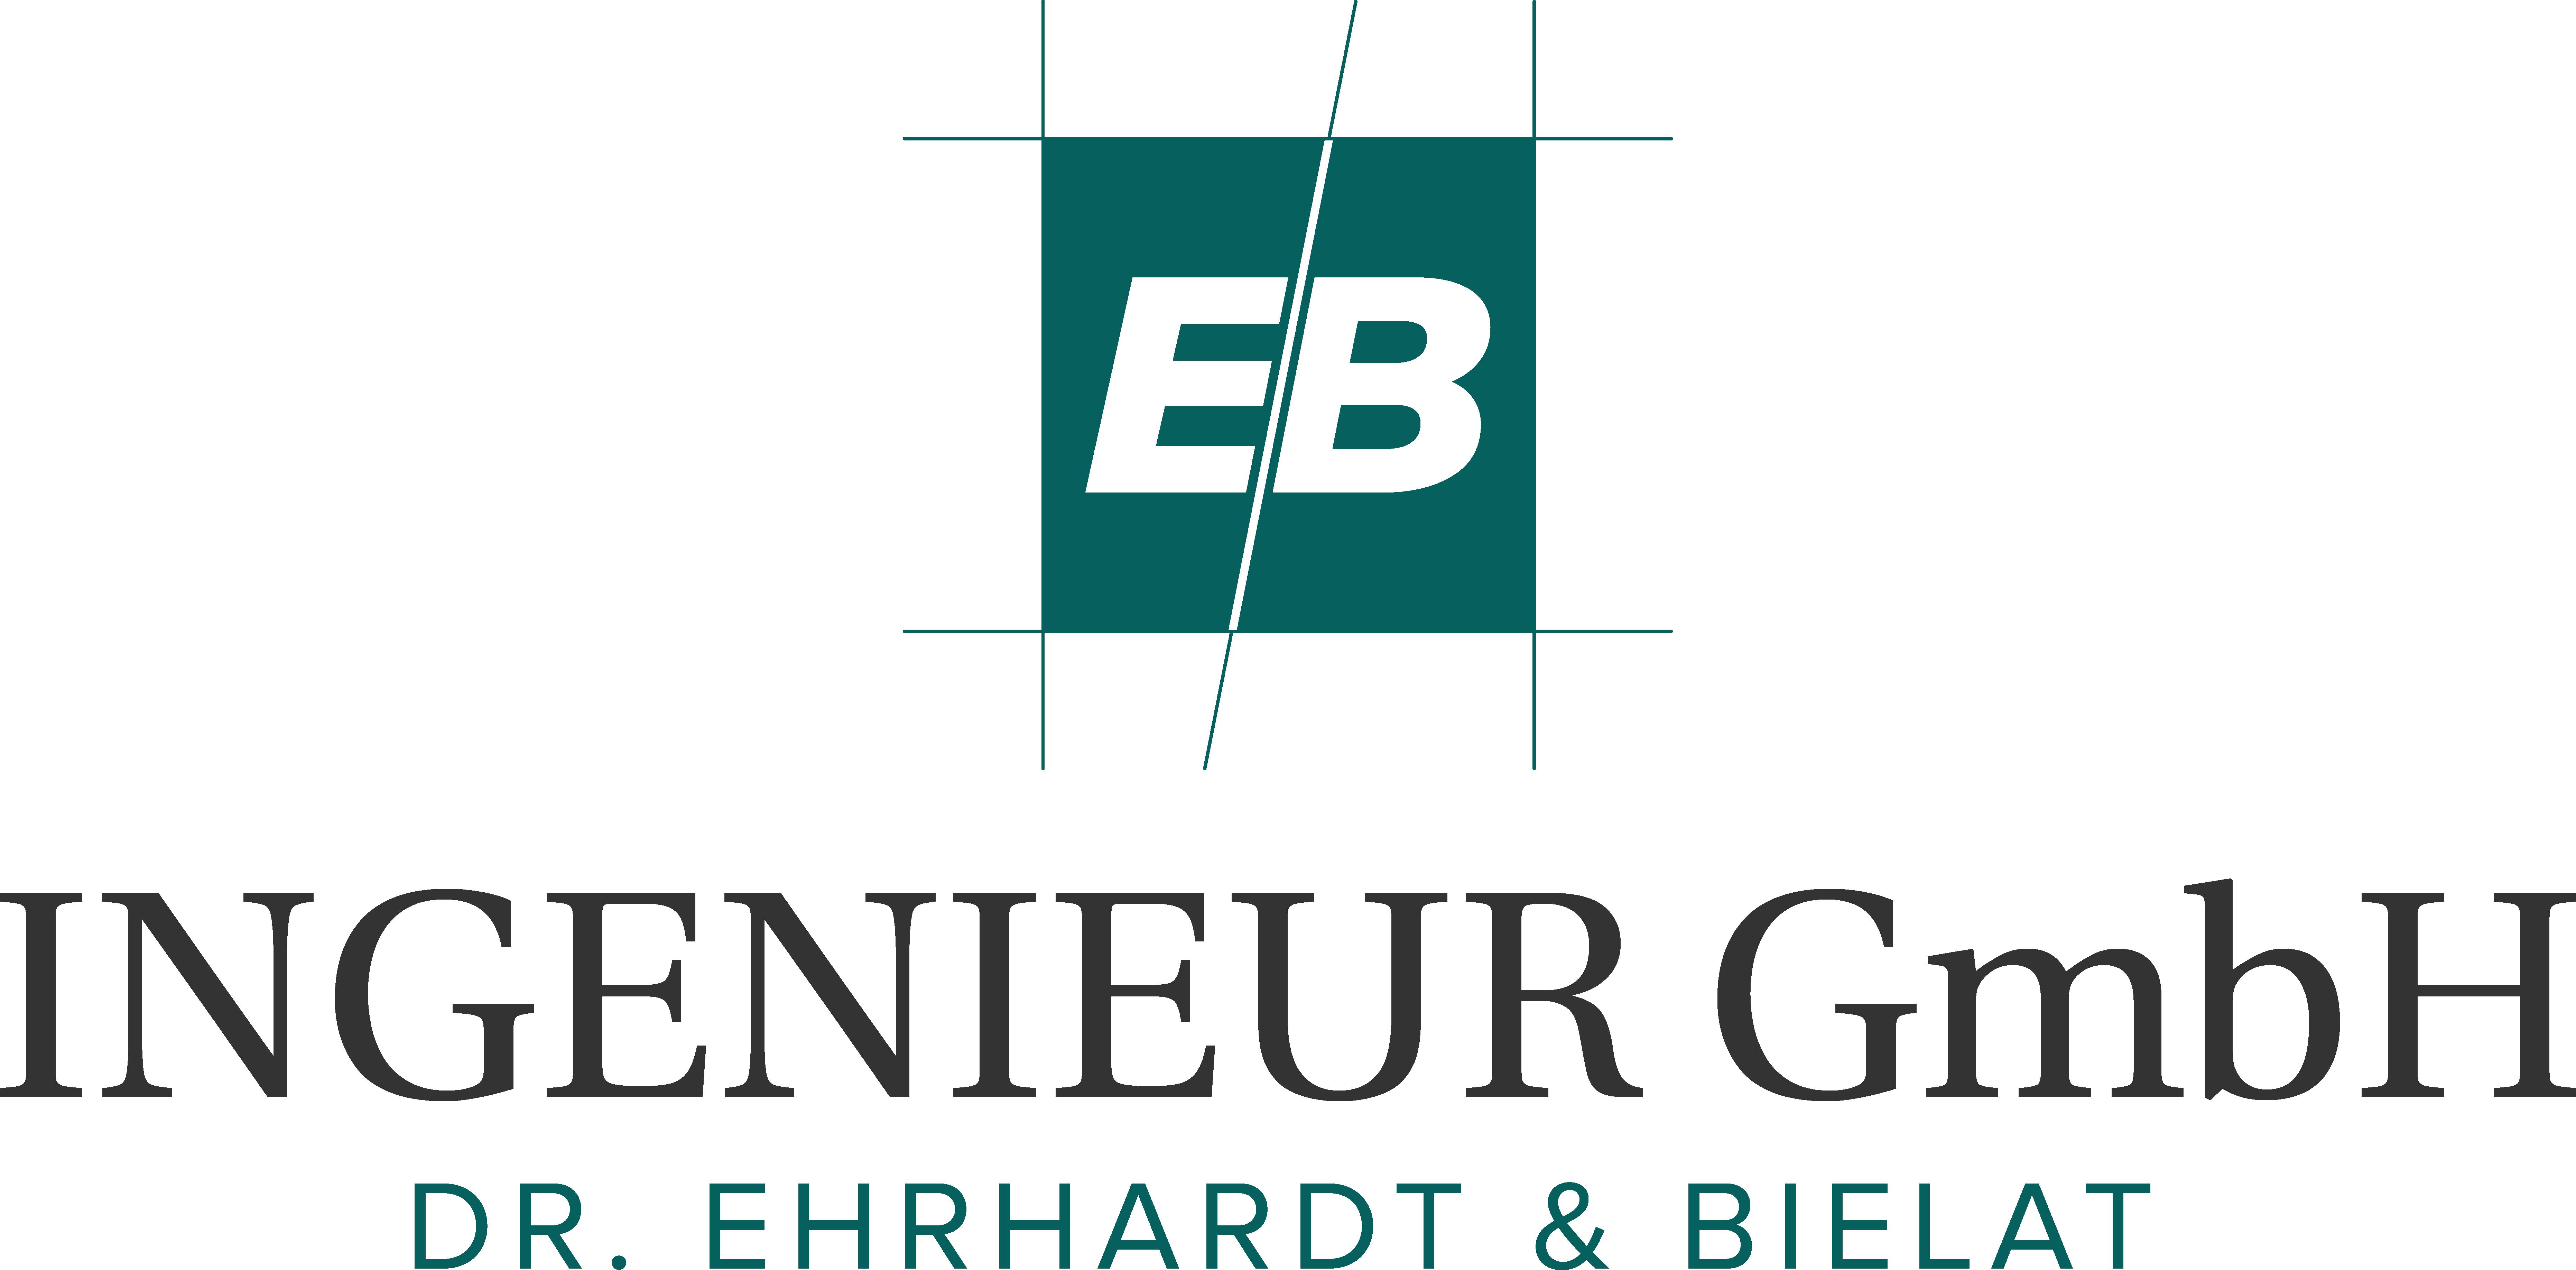 EB INGENIEUR GmbH